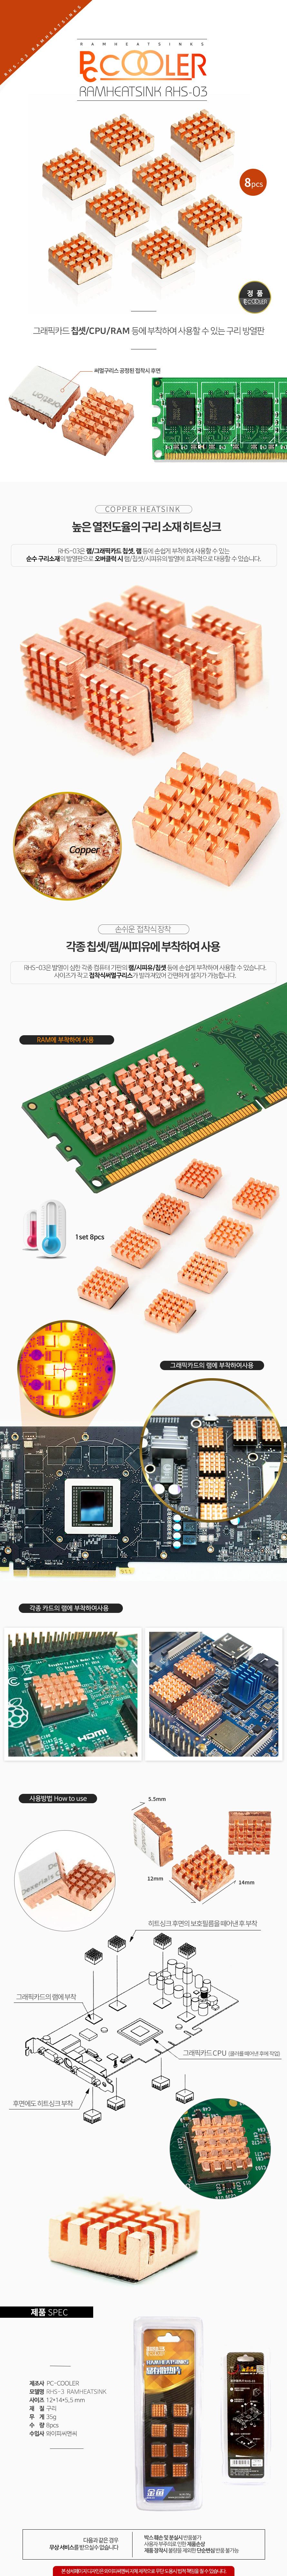 PCCOOLER 칩셋 방열판 RHS-03